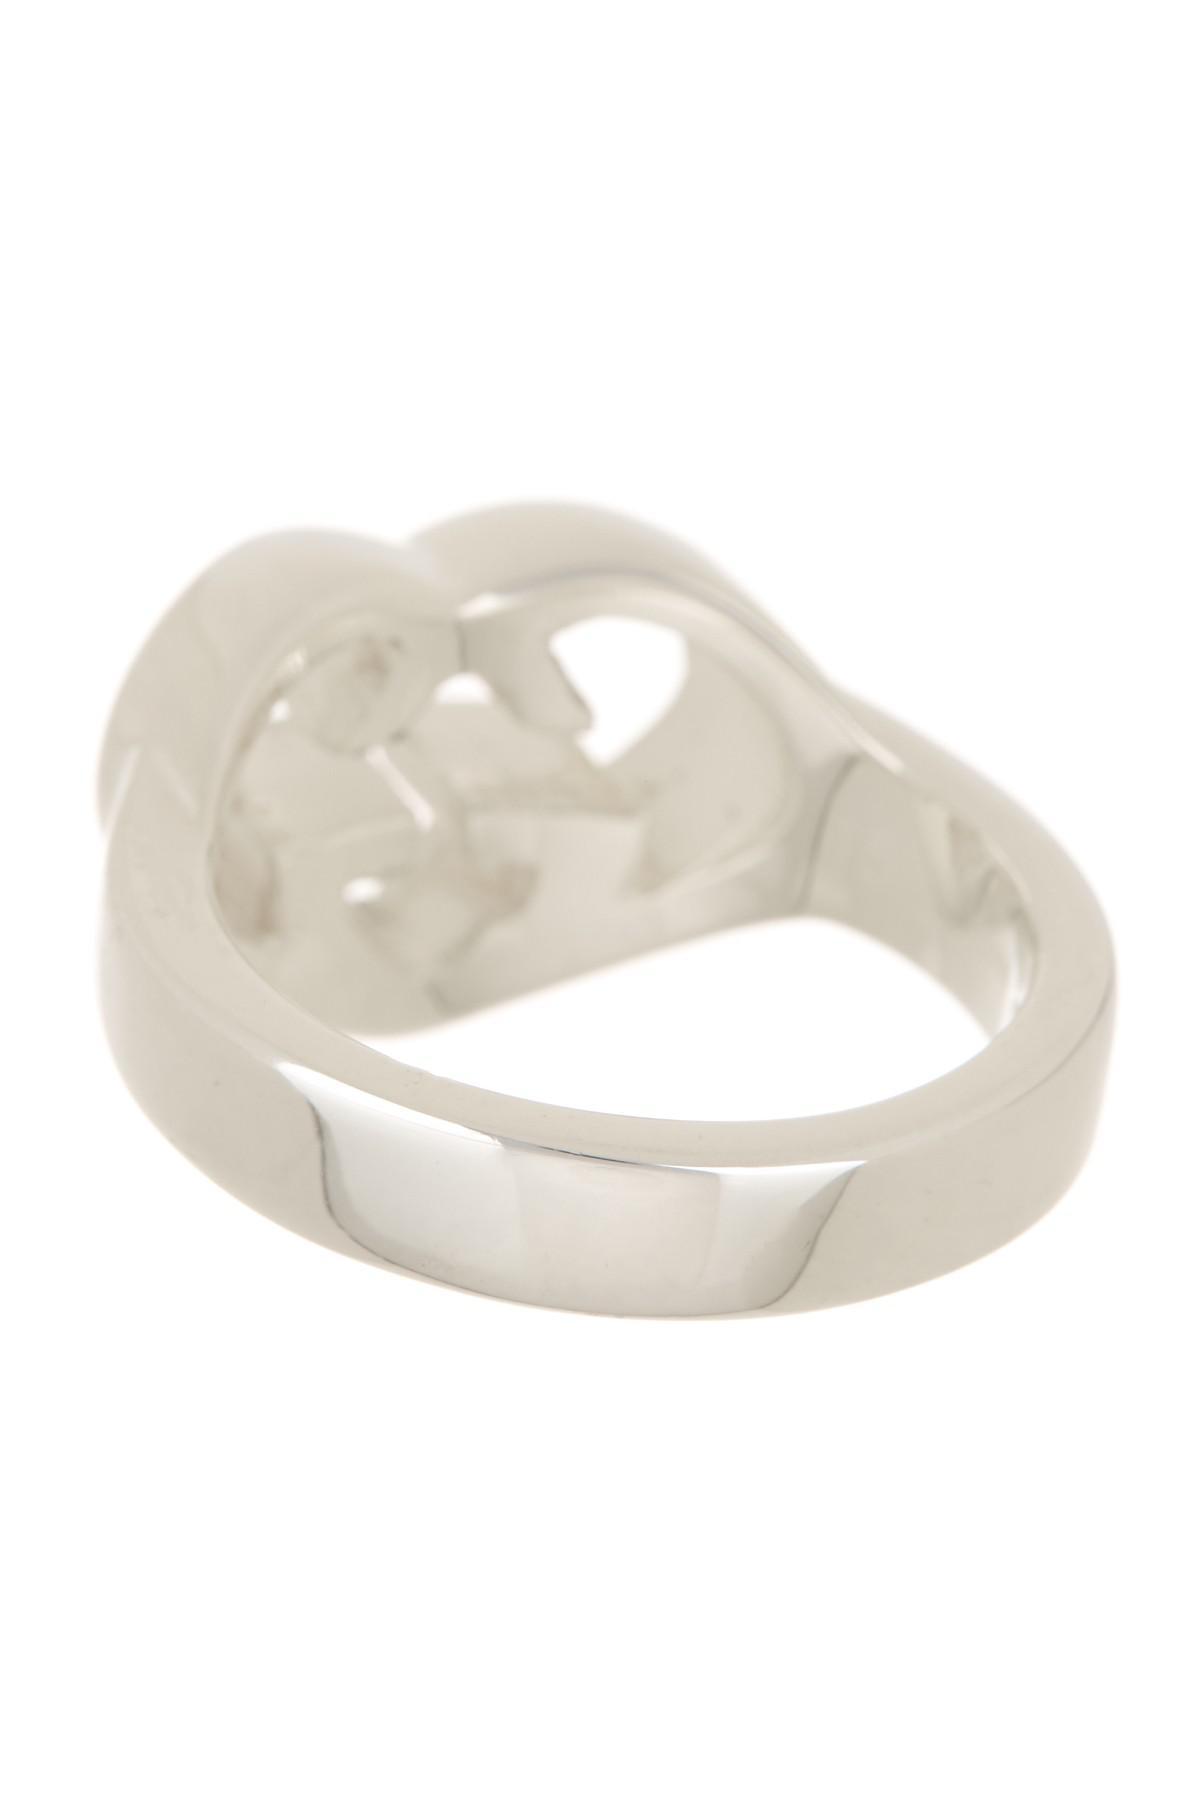 1ae85f287c7 Lyst - Gucci Sterling Silver Love Britt Ring - Size 7 in Metallic